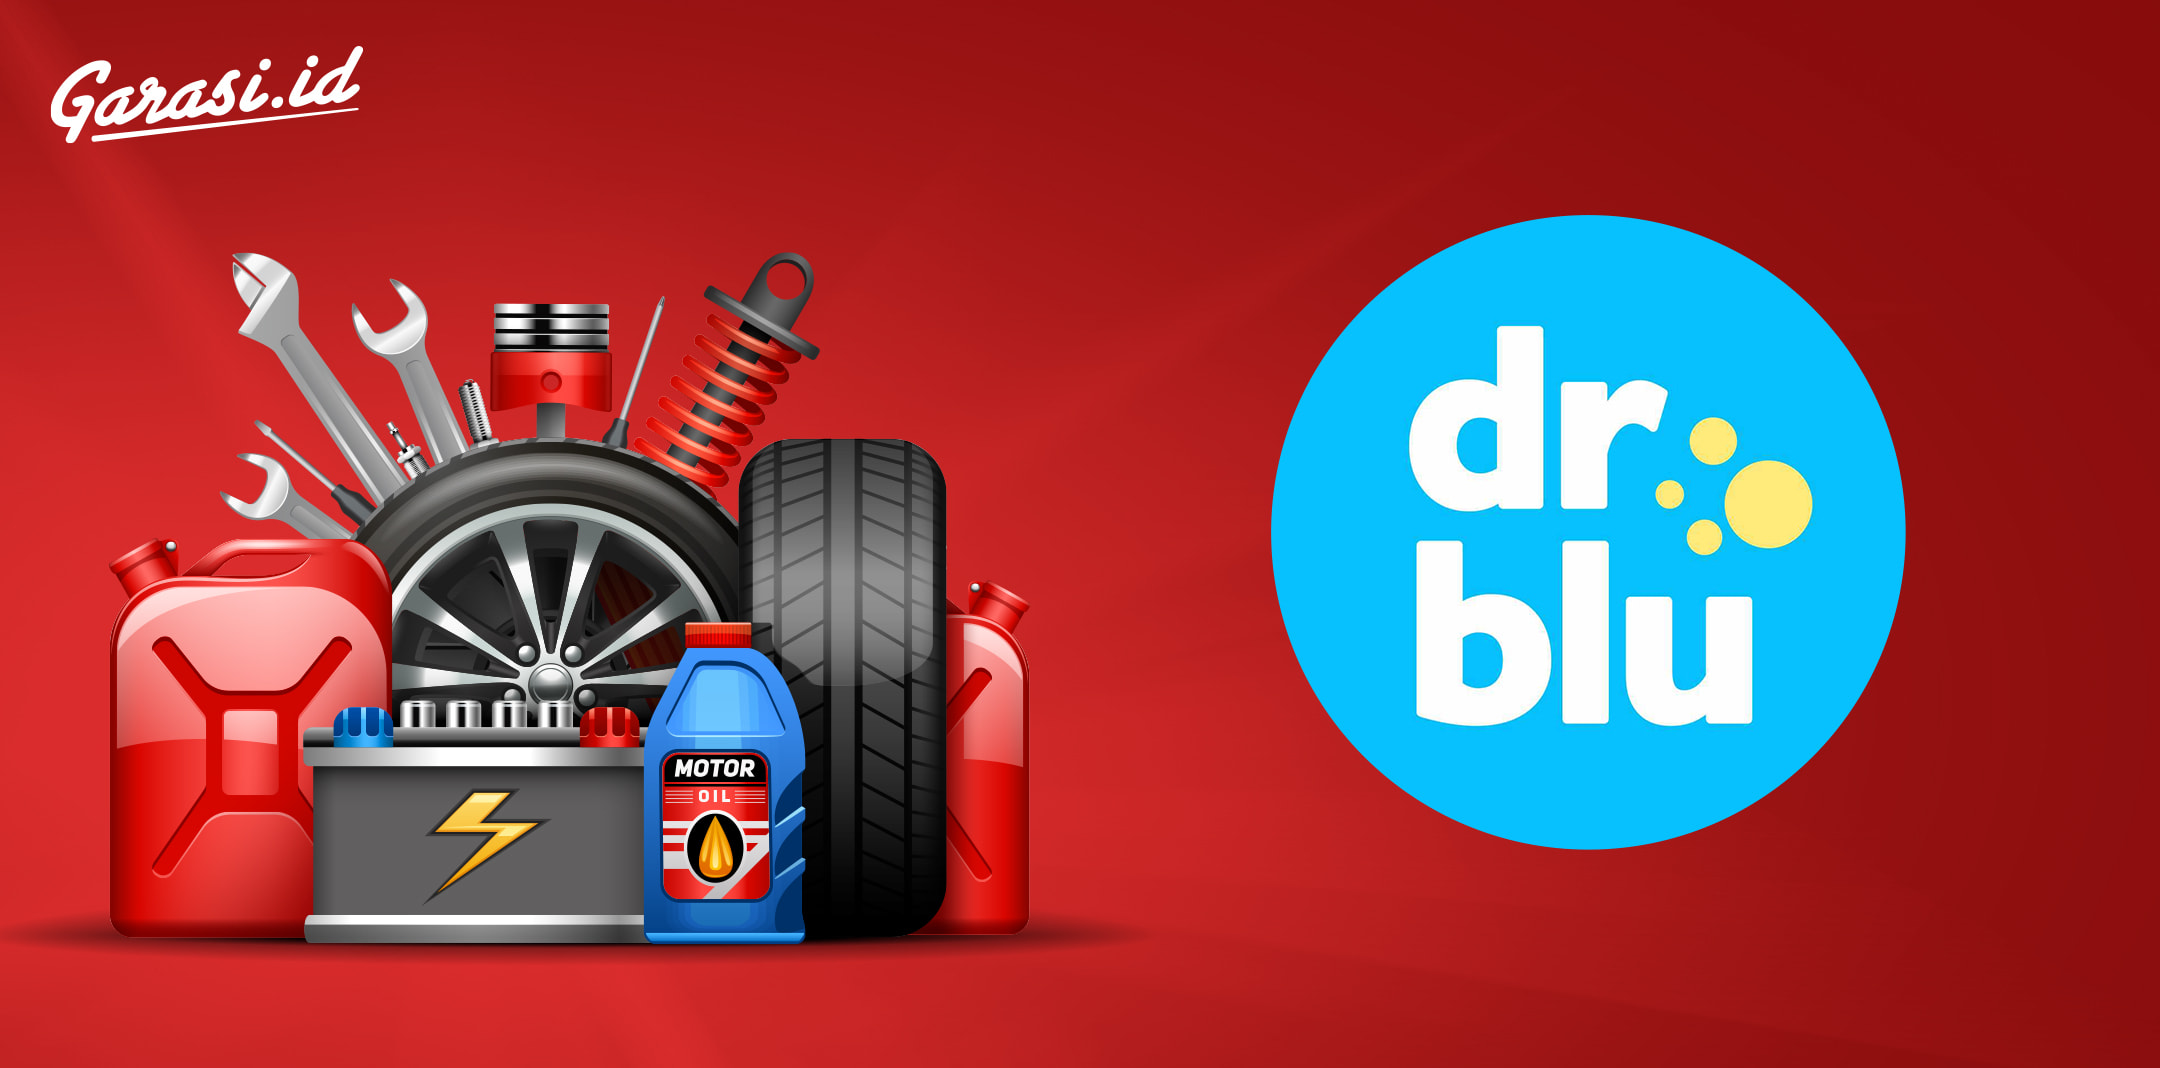 Dr. Blu Delivery Carwash